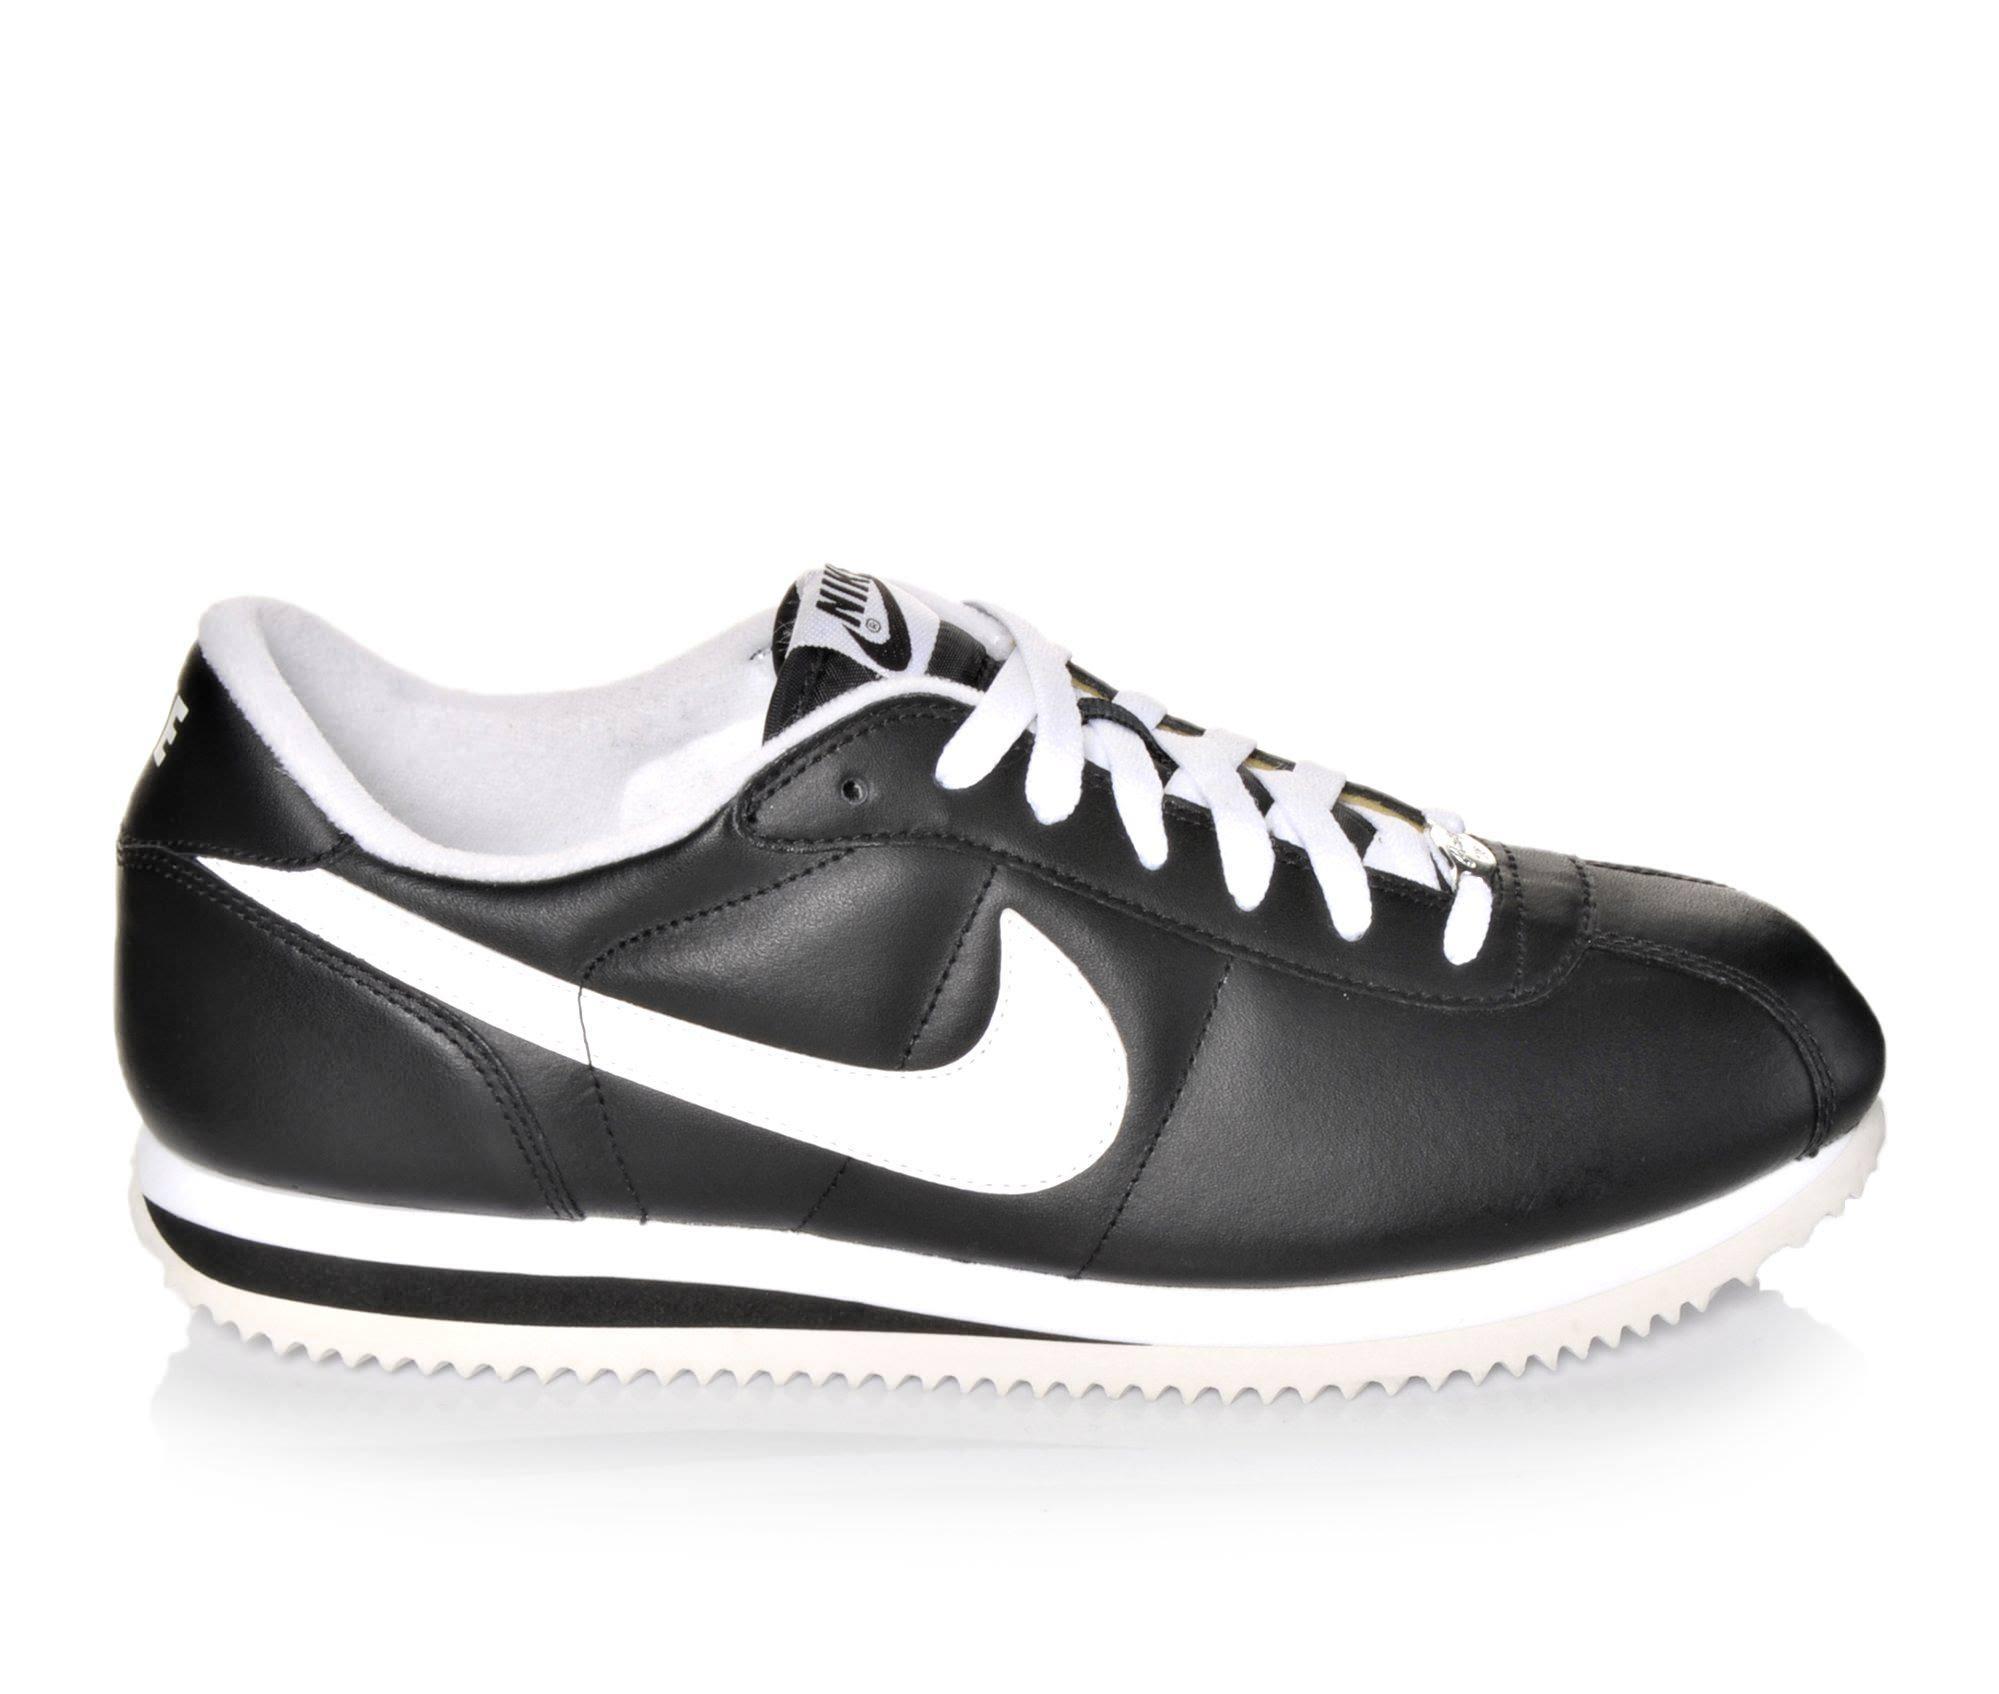 Hombre Silv Metálico Blanco Blanco metálico 819719012 Plata Nike Zapatillas Negro Cortez vYww7IqE